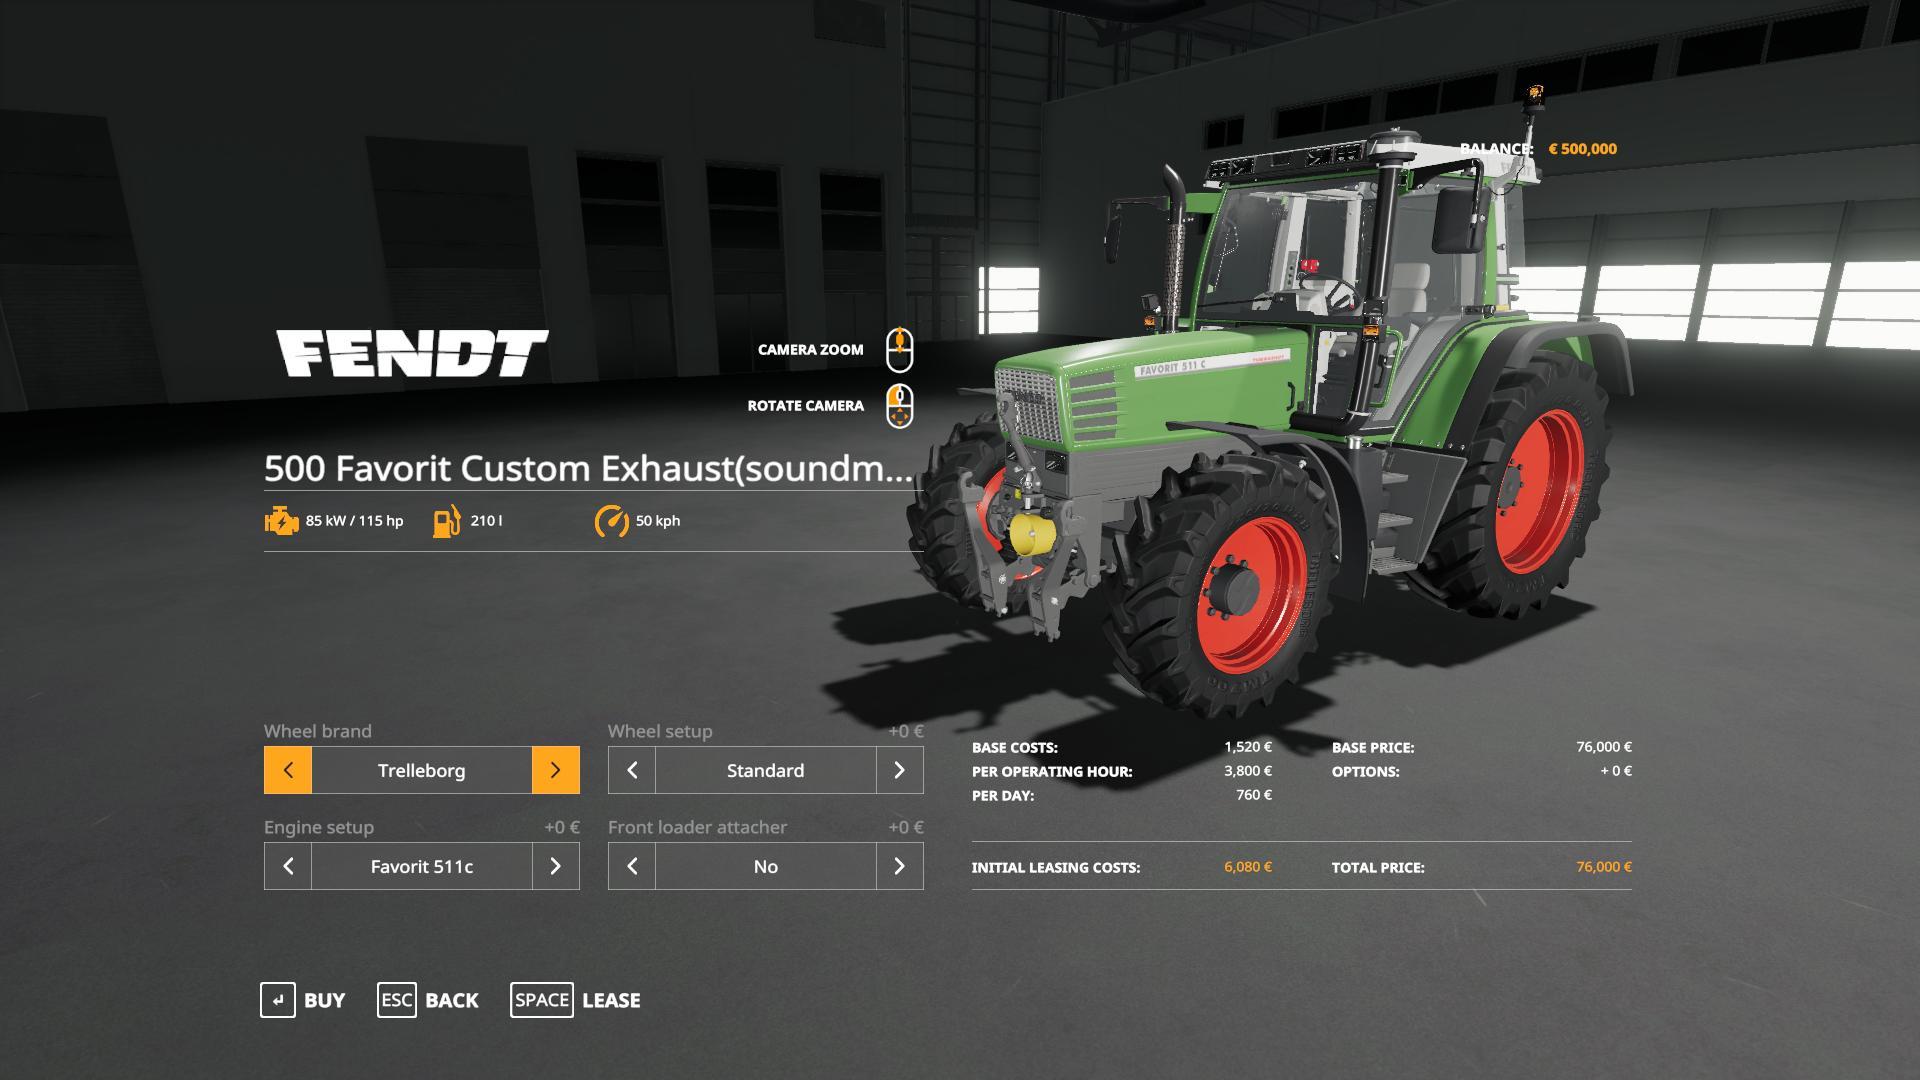 Tractor Fendt Favorit Custom Exhaust Sound V0 9 Farming Simulator 19 Mod Ls19 Mod Download